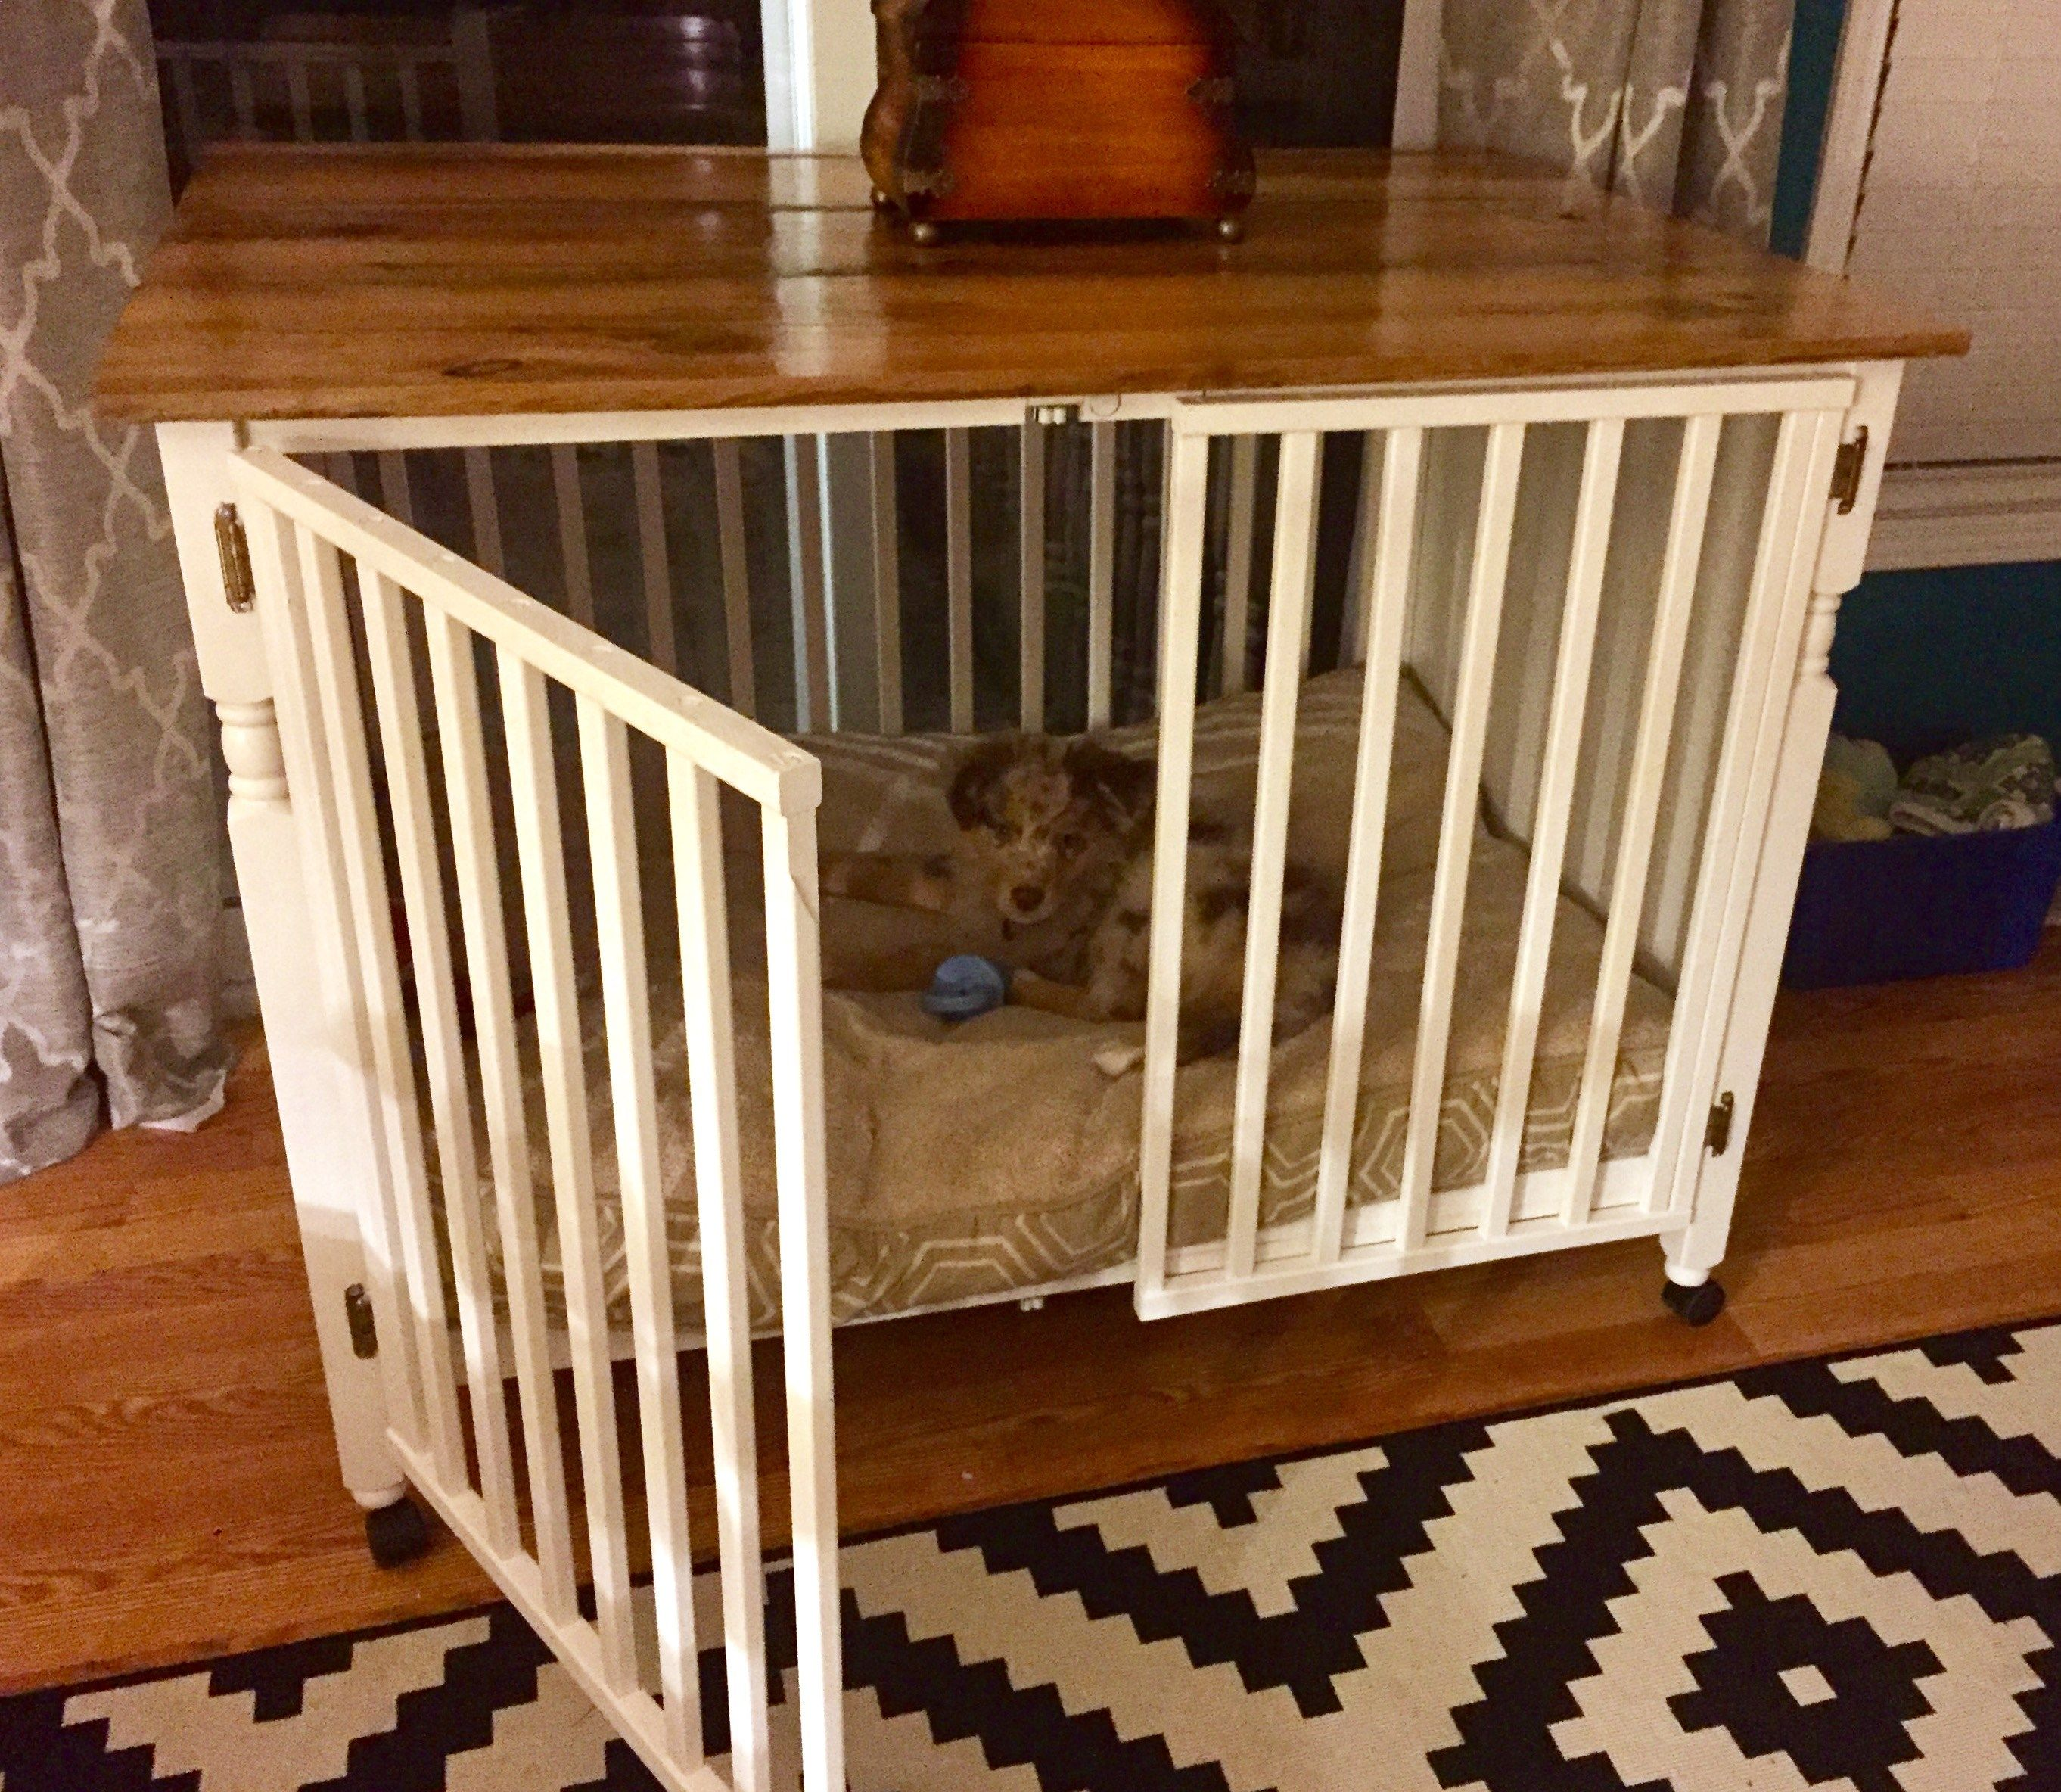 repurpose furniture dog. Repurposed Crib To Dog Crate With Barn Board Table Top. More Repurpose Furniture D